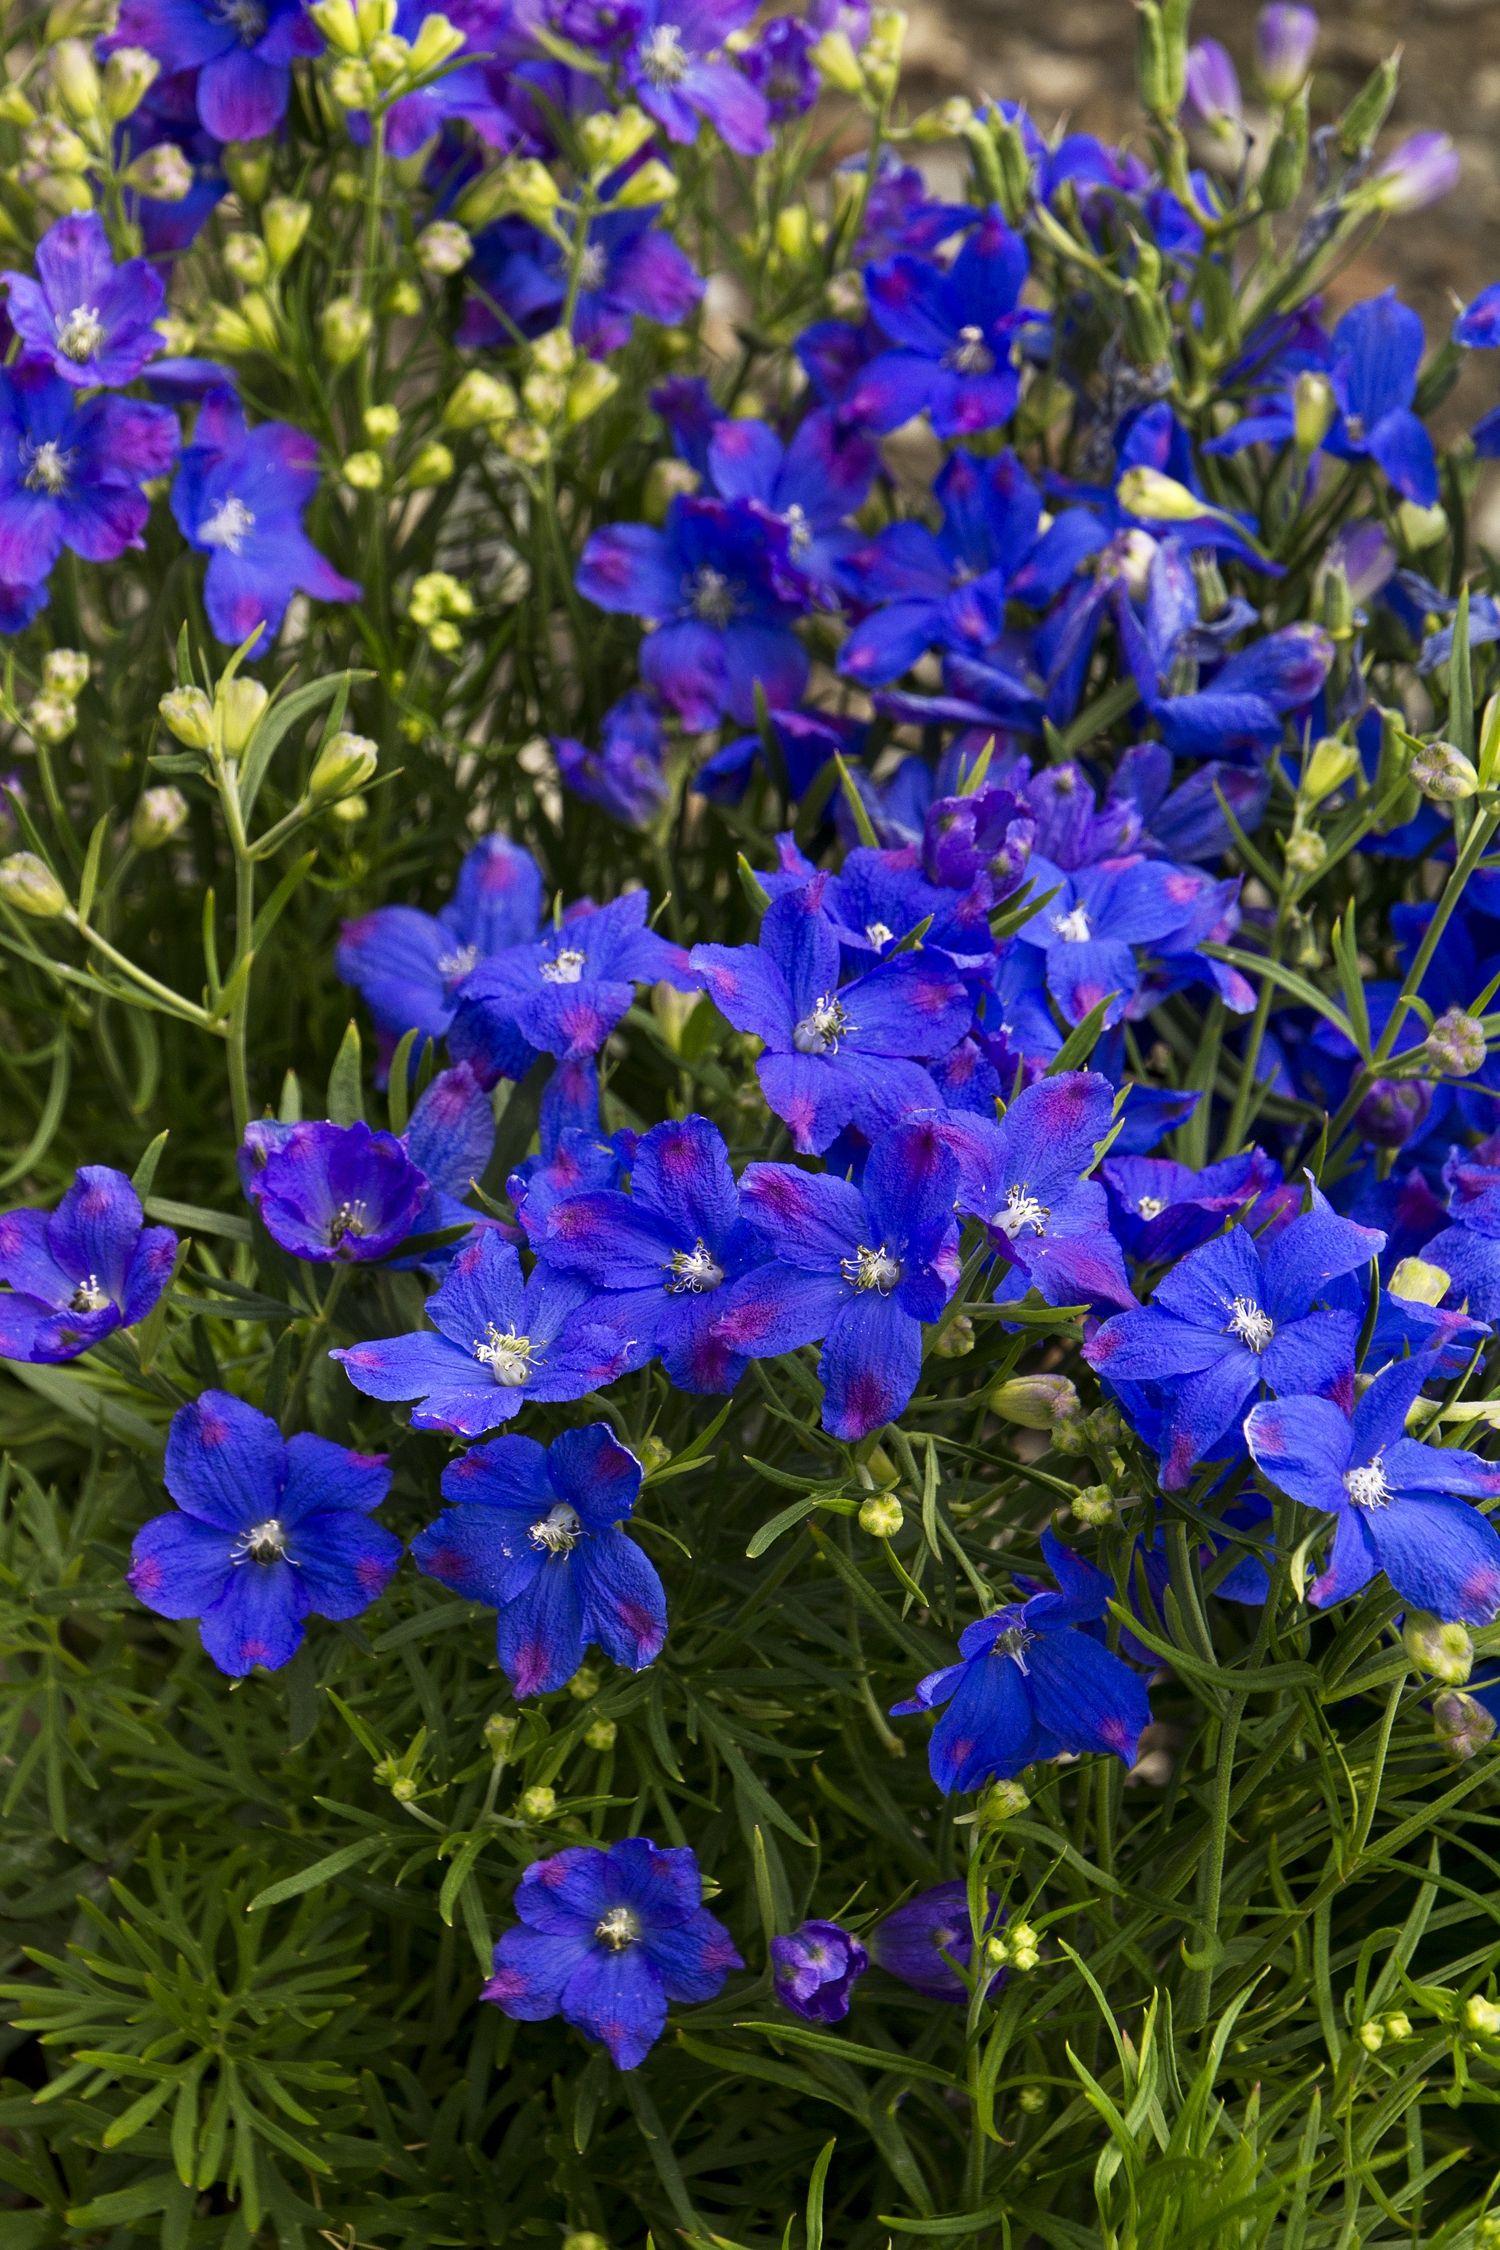 Blue Mirror Delphinium Tall Spires Of Brilliant Violet Blue Flowers